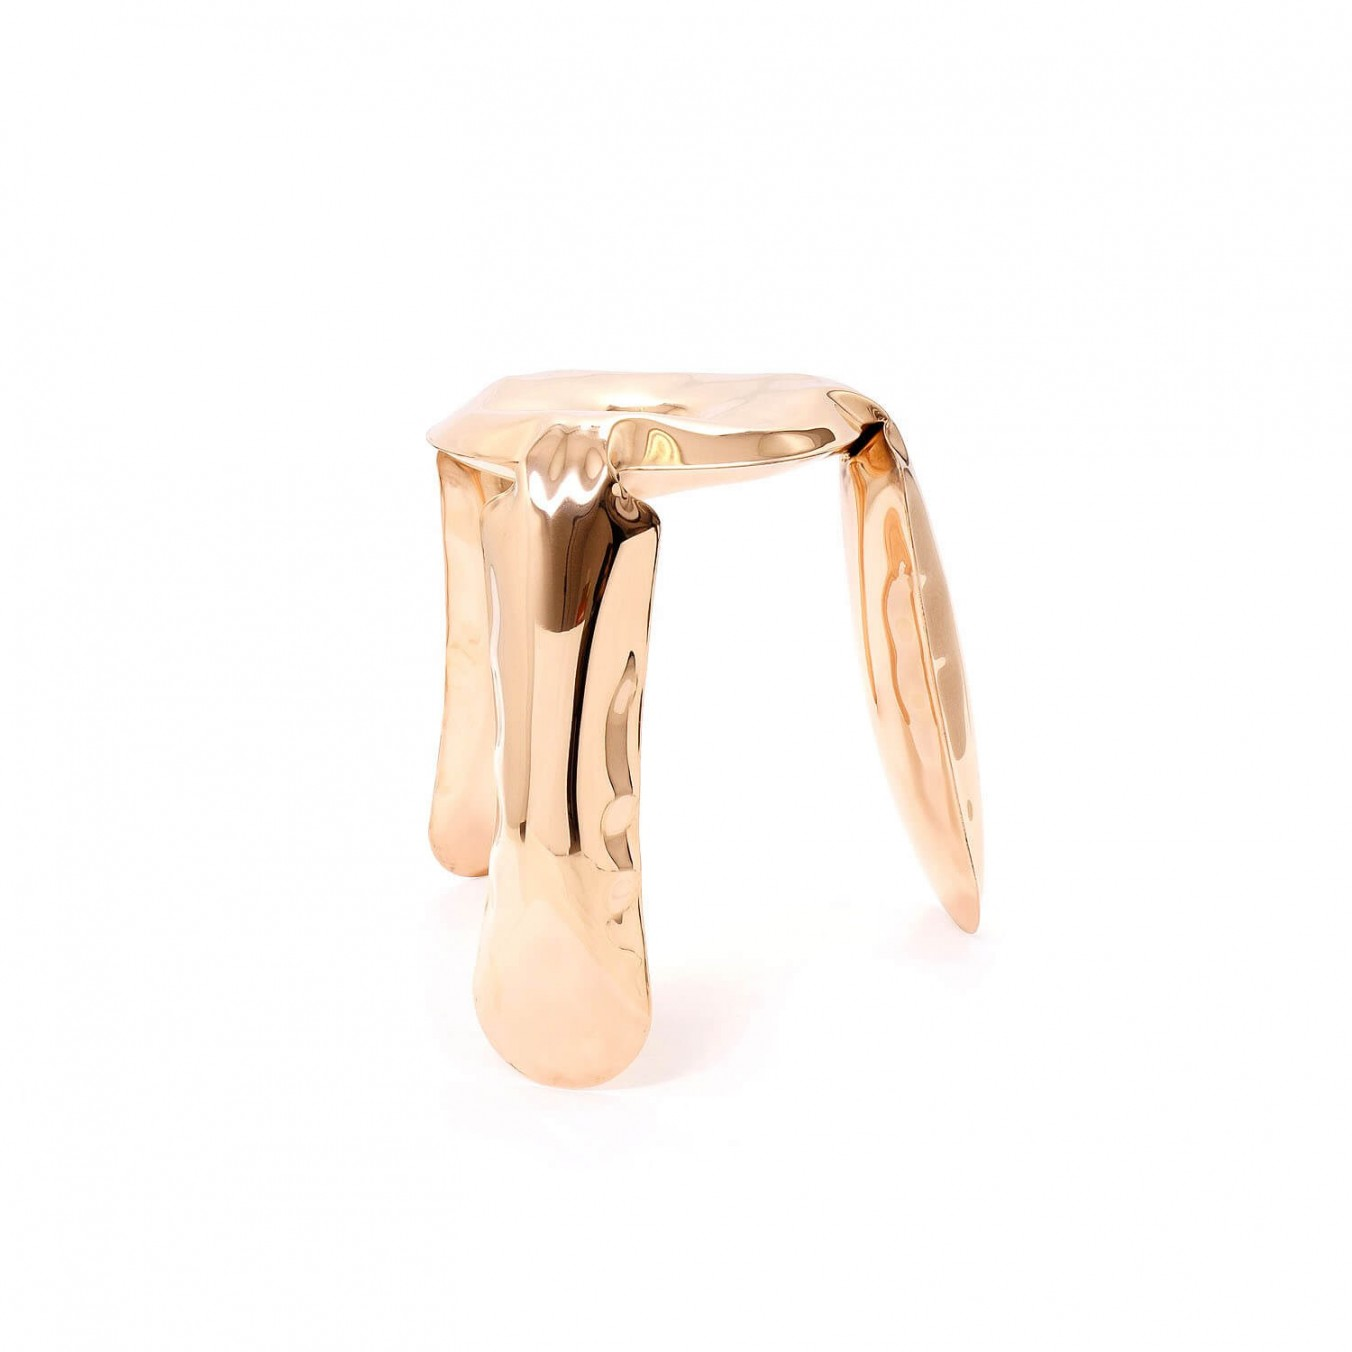 Plopp copper